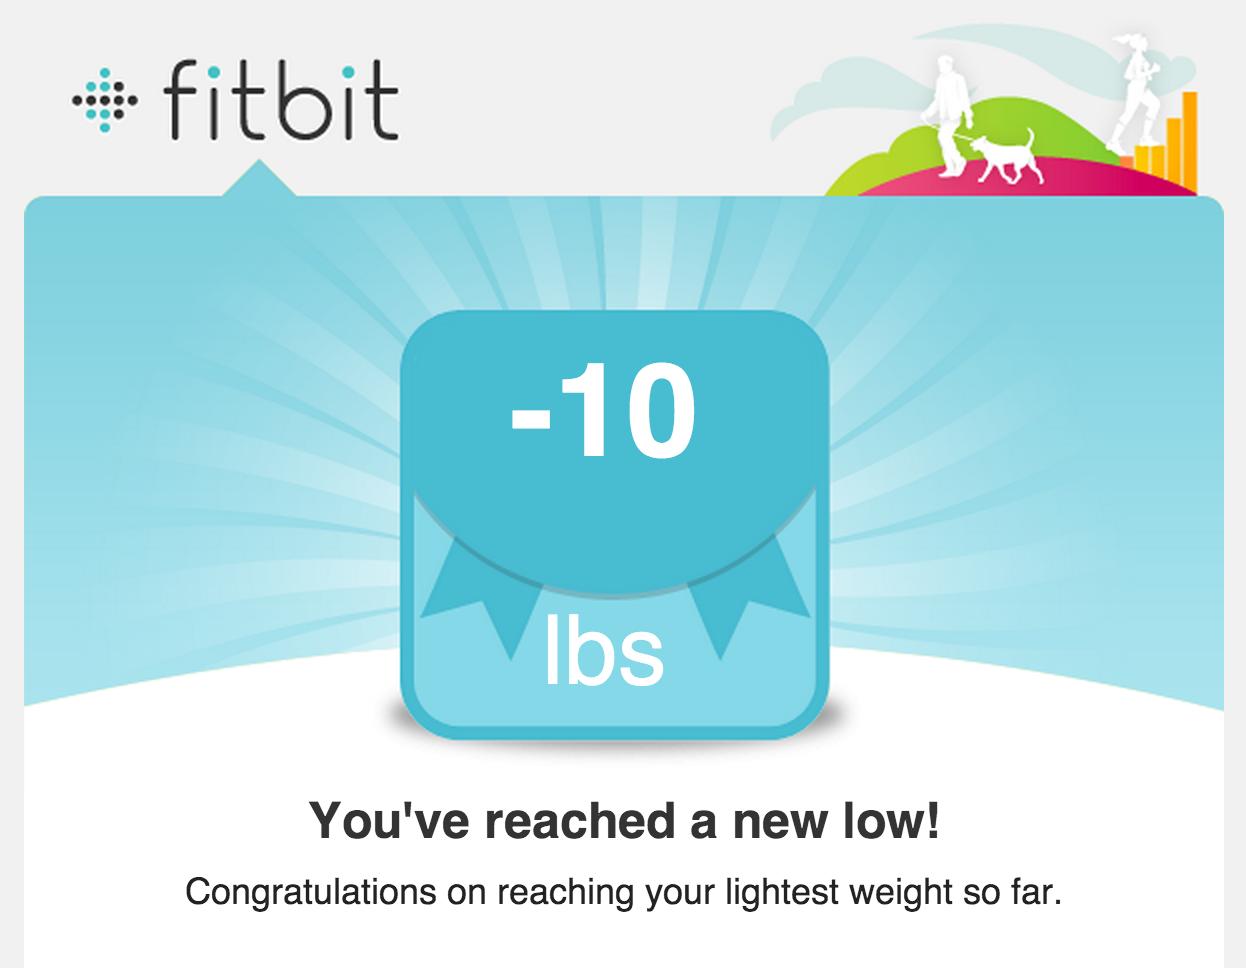 Thanks Fitbit!